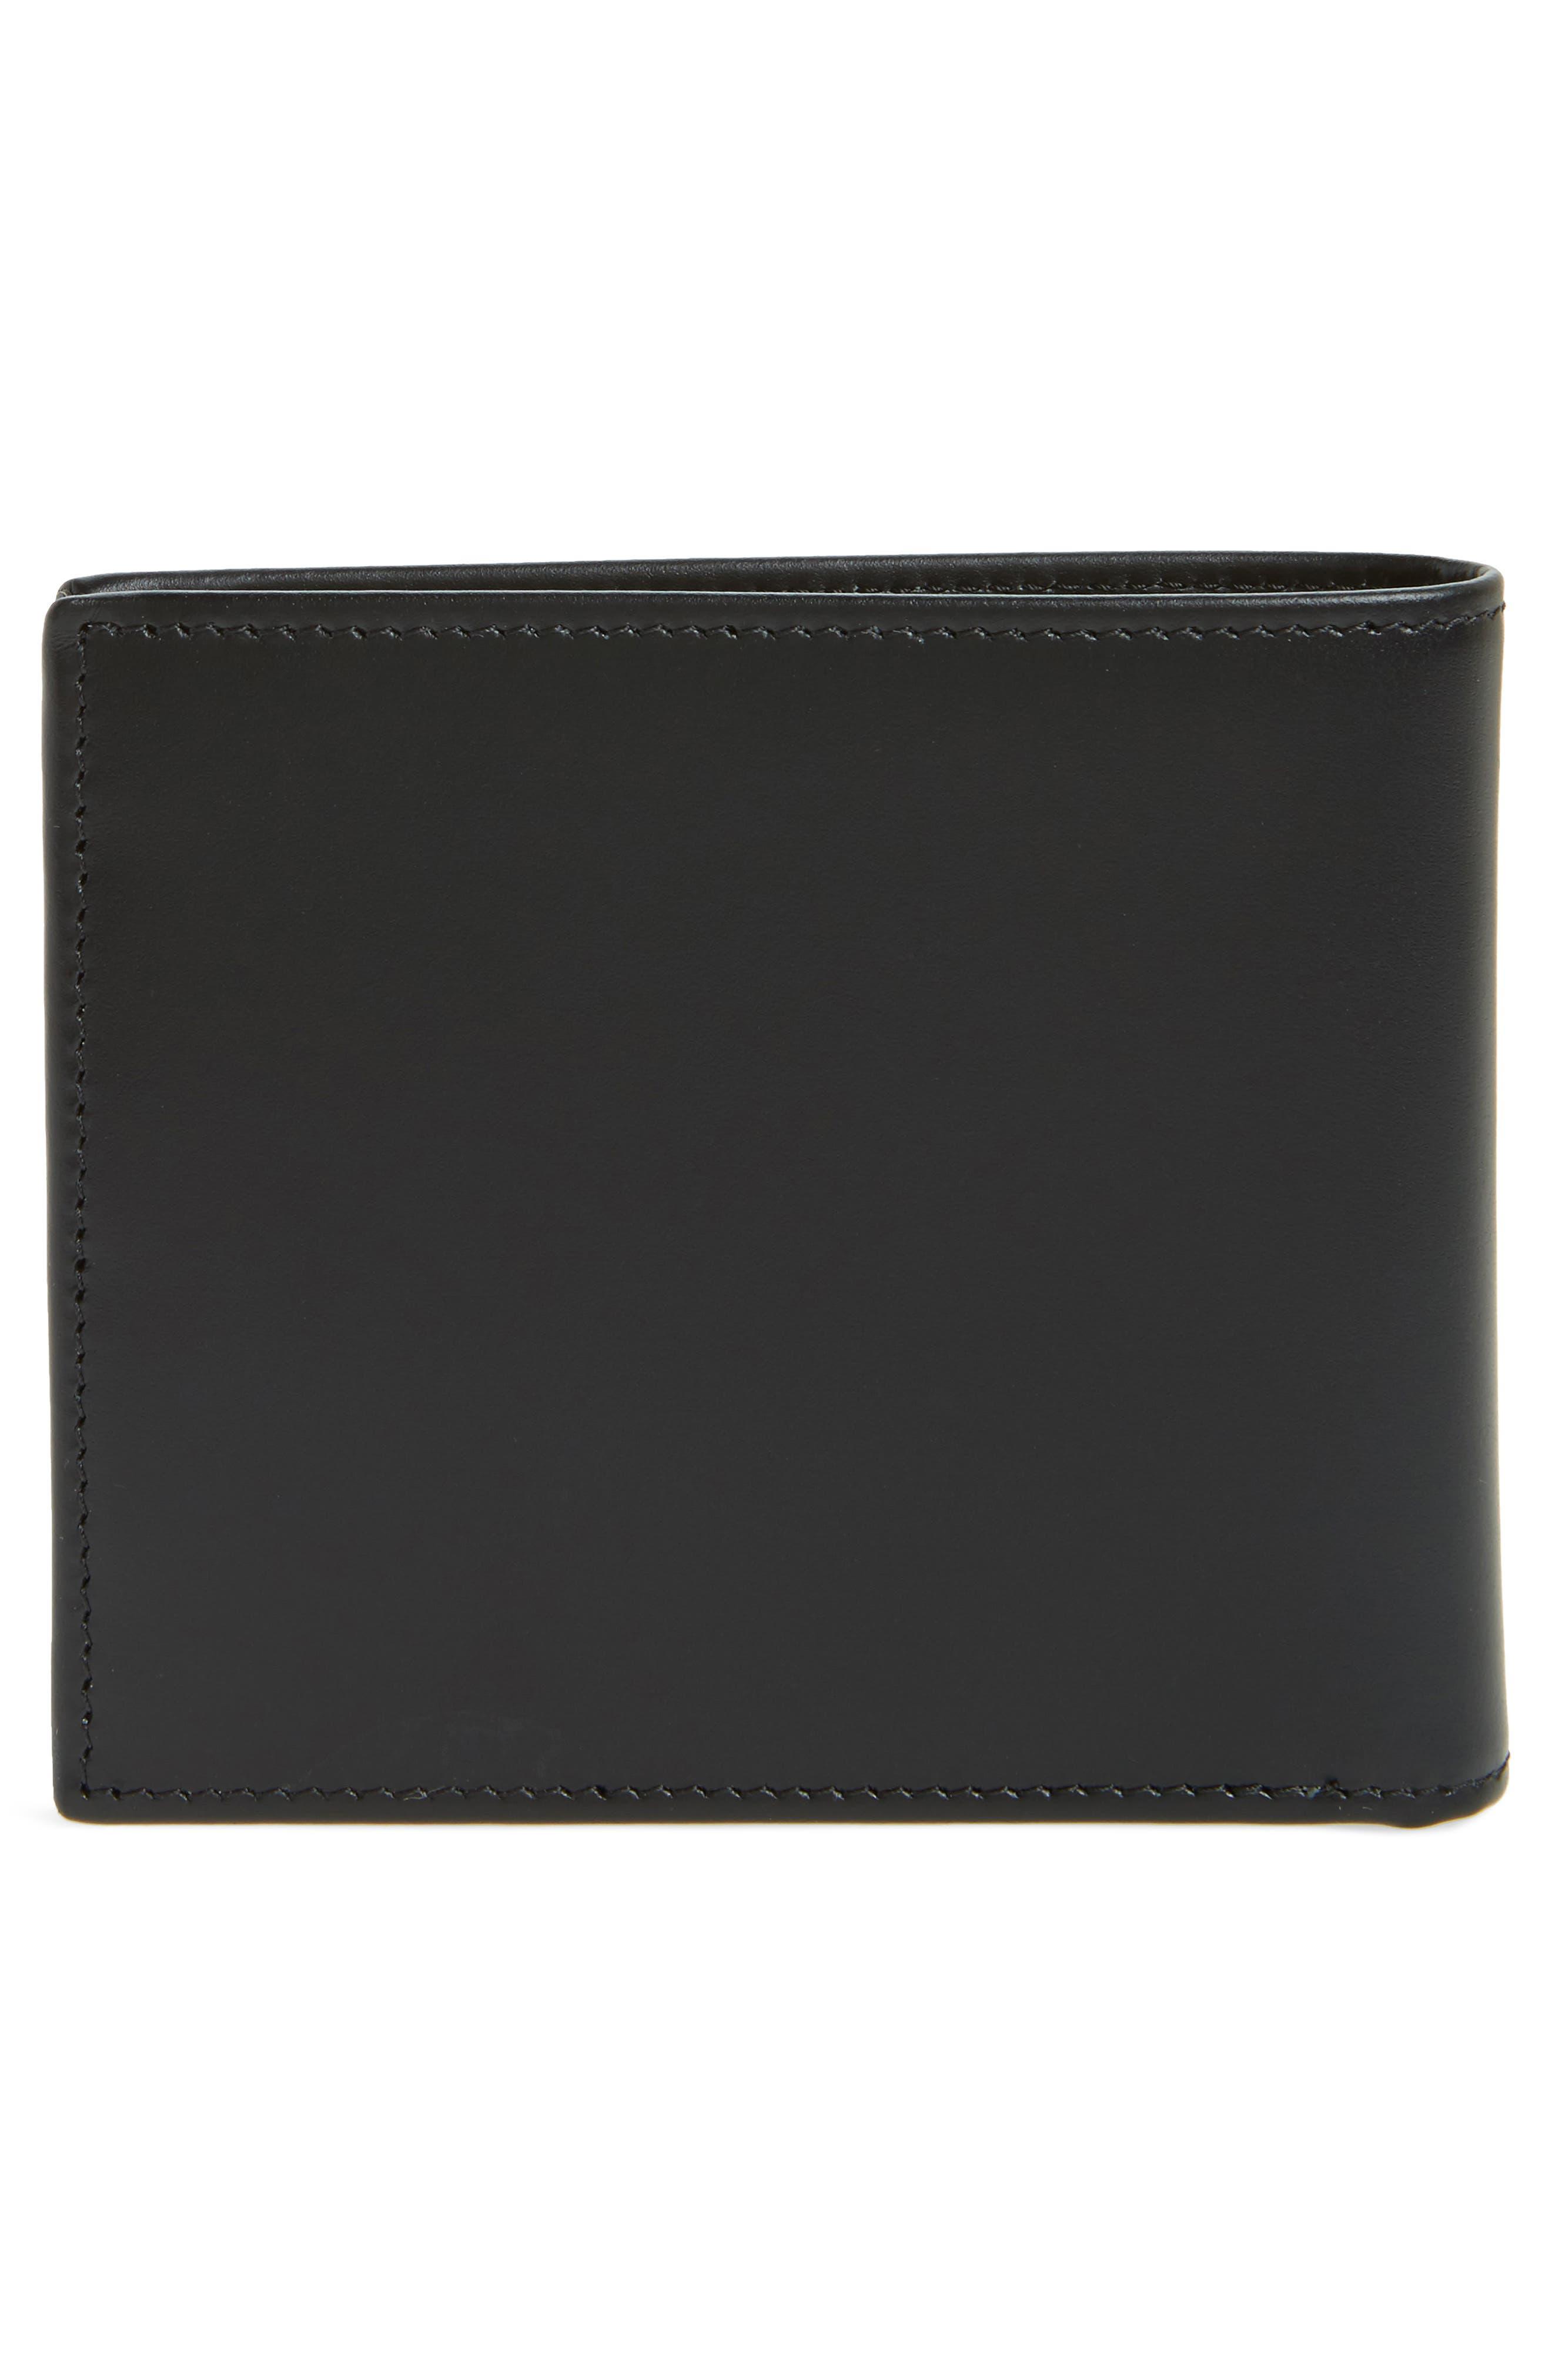 Multistripe Leather Bifold Wallet,                             Alternate thumbnail 3, color,                             Black